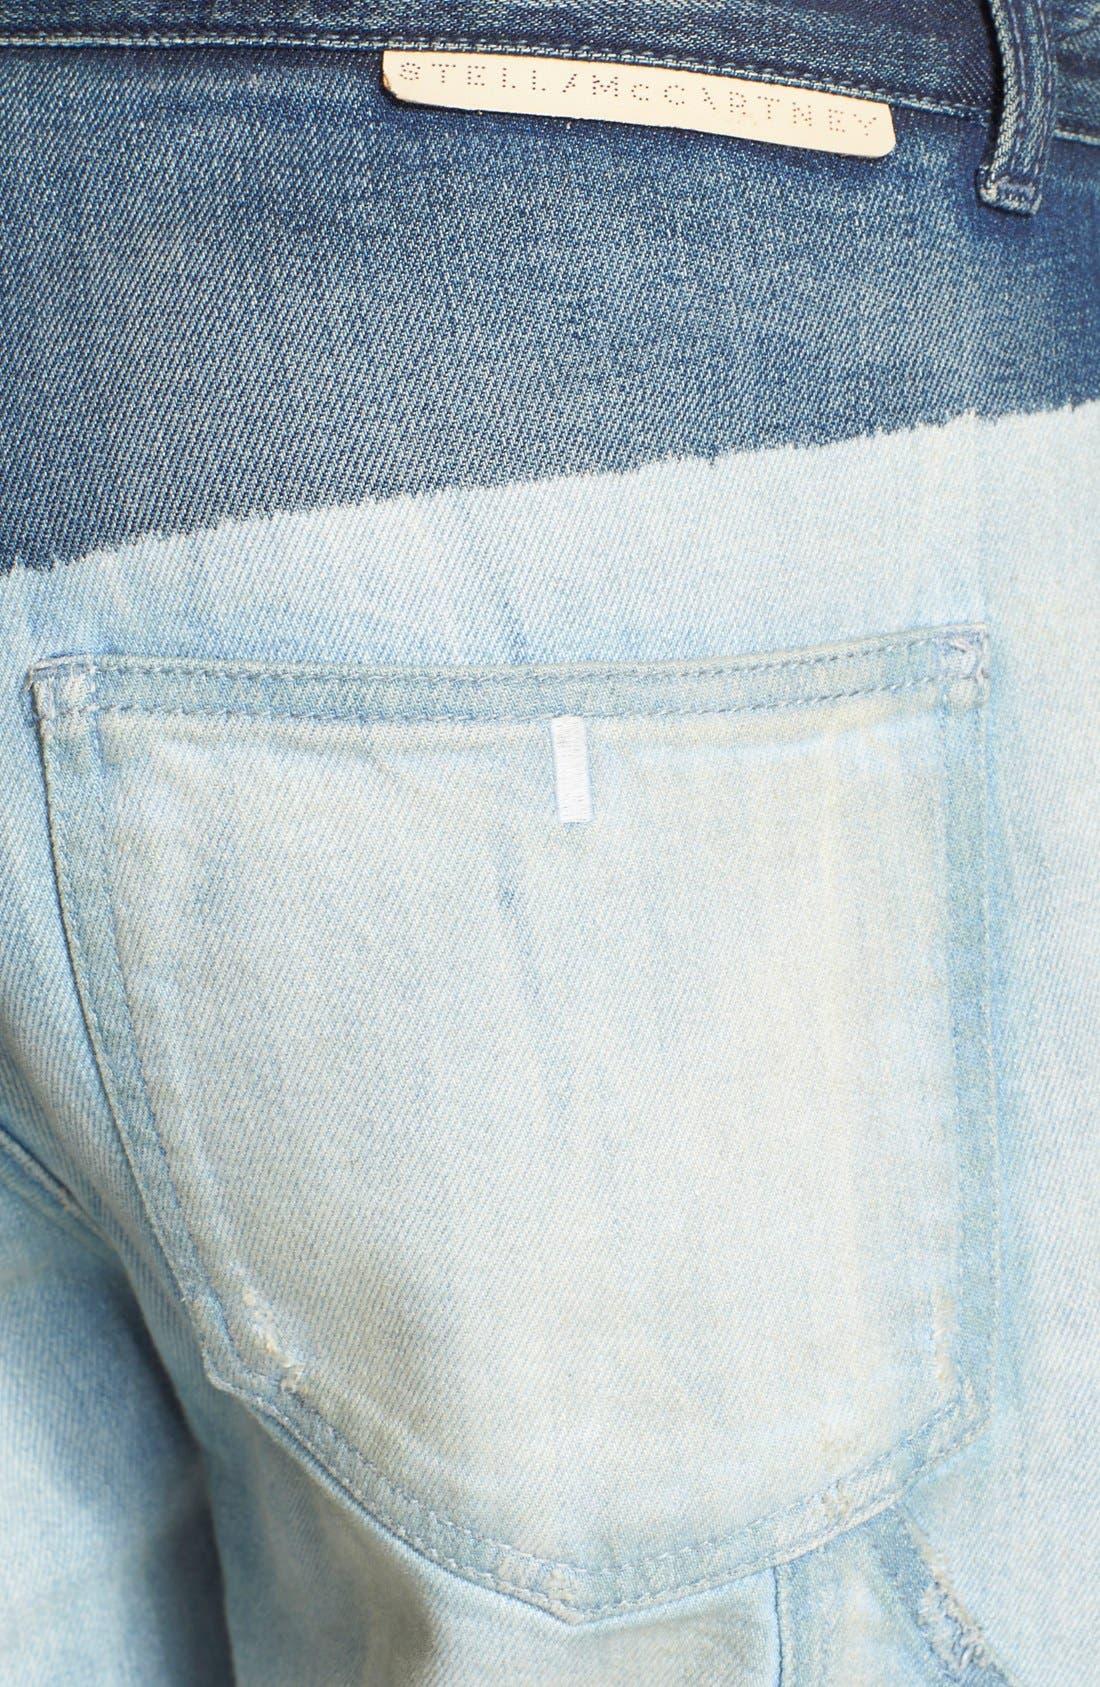 Alternate Image 3  - Stella McCartney 'The Patchwork' Boyfriend Jeans